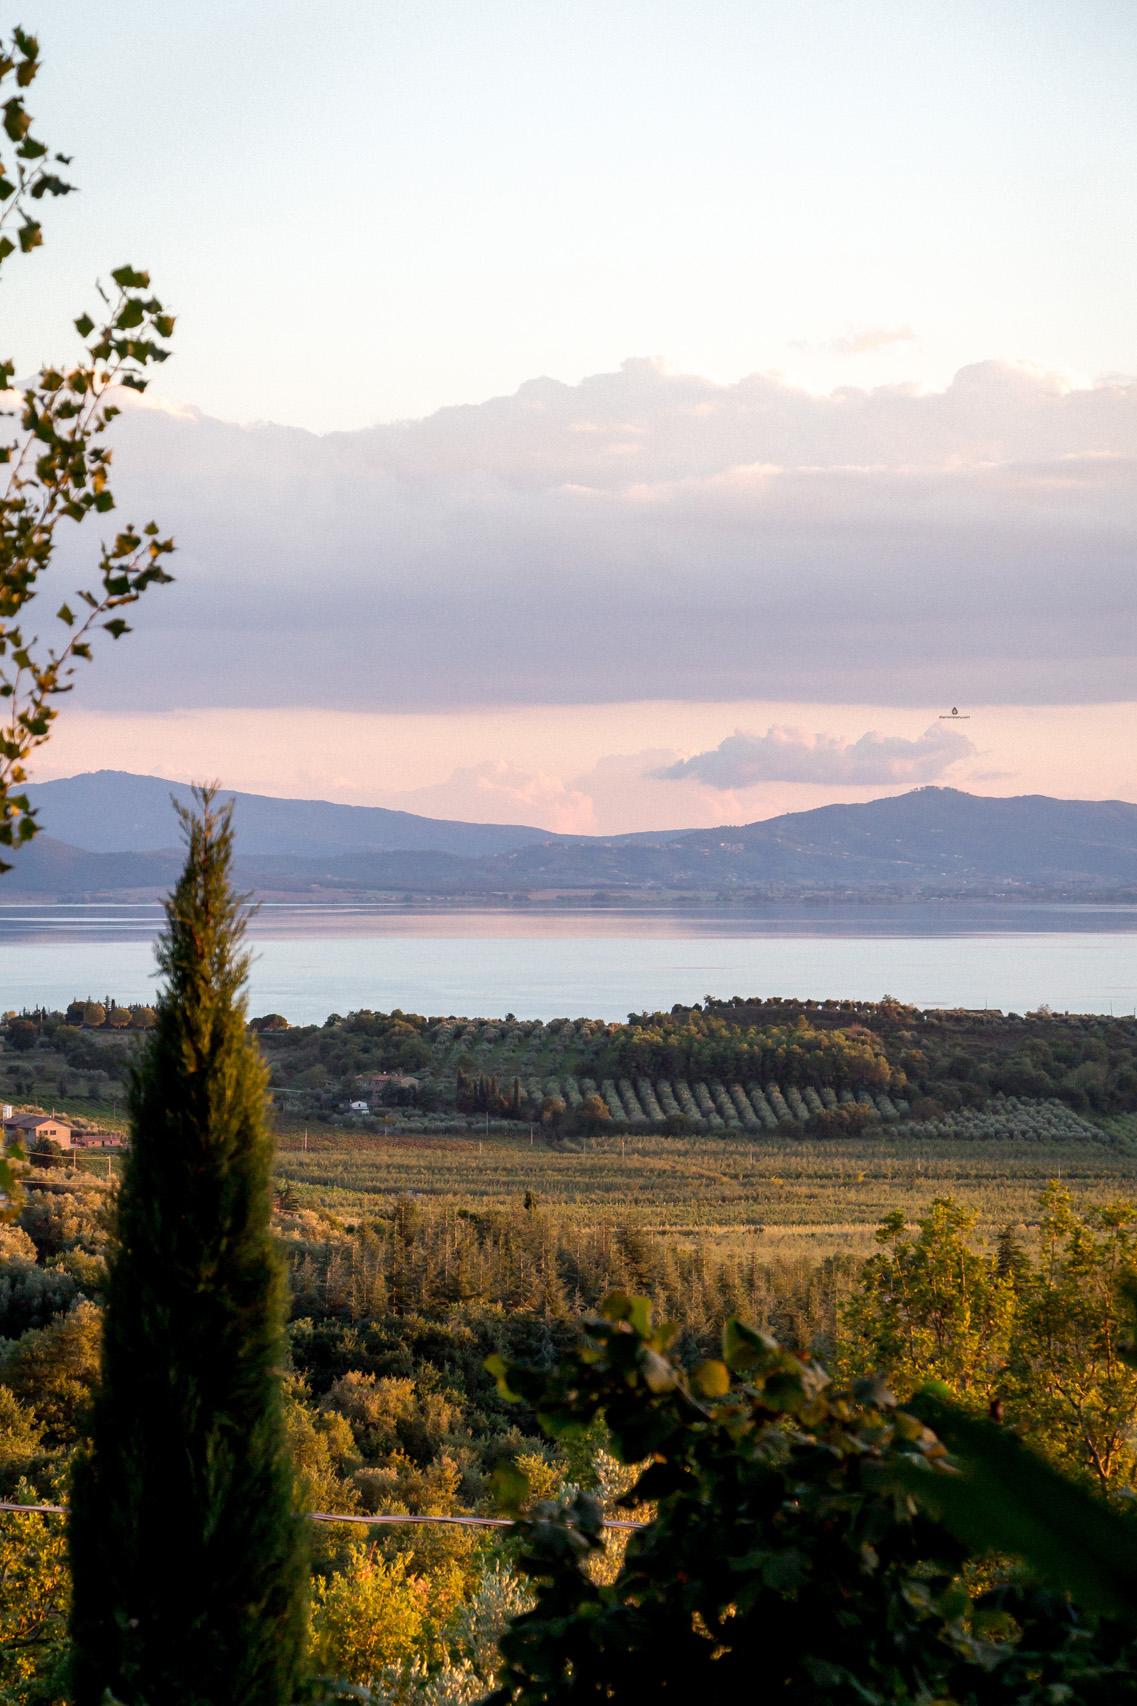 Views of Trasimeno lake, Umbria